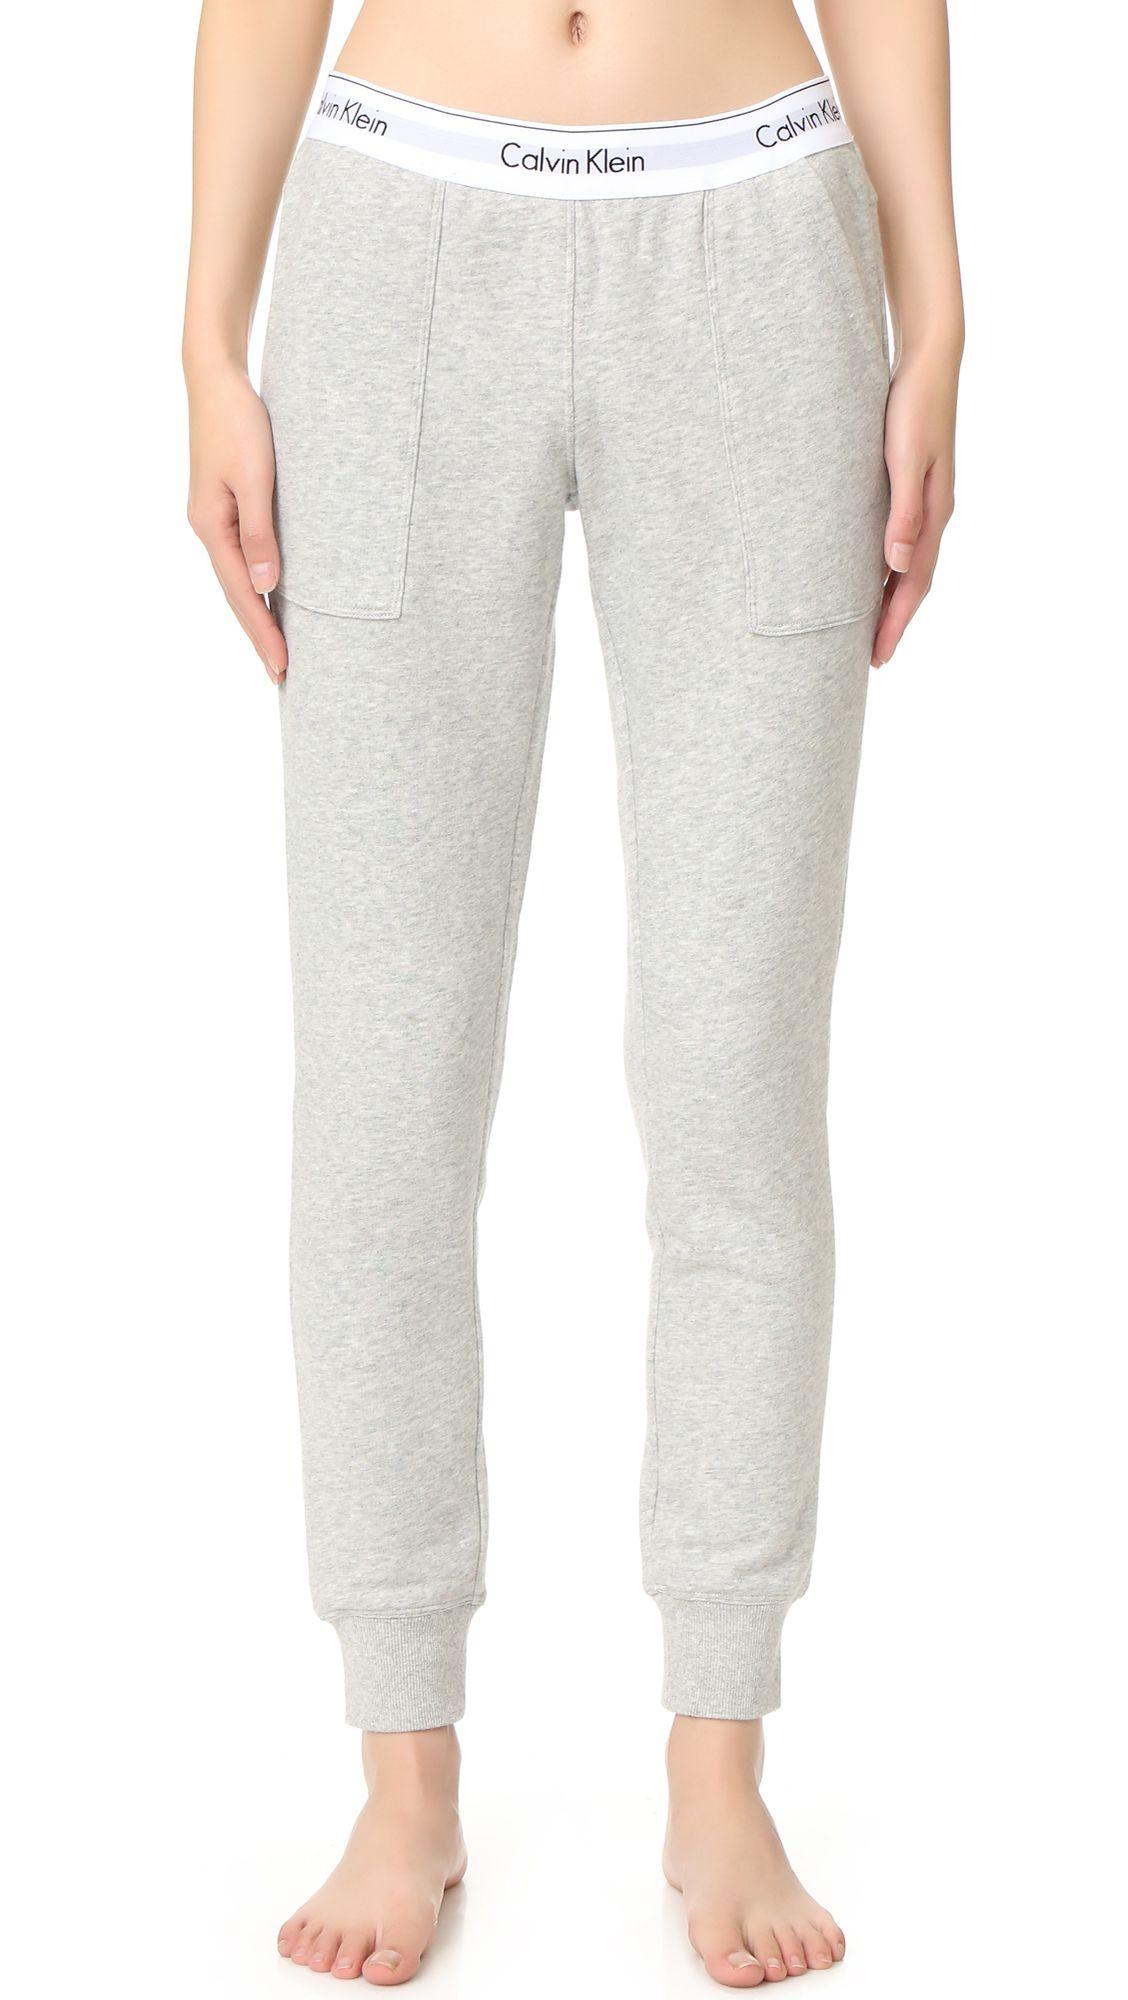 28e7a691f67f Calvin Klein Underwear Modern Cotton Jogger Pants - Grey Heather. Slouchy Calvin  Klein Underwear sweatpants with a classic logo print elastic waistband.